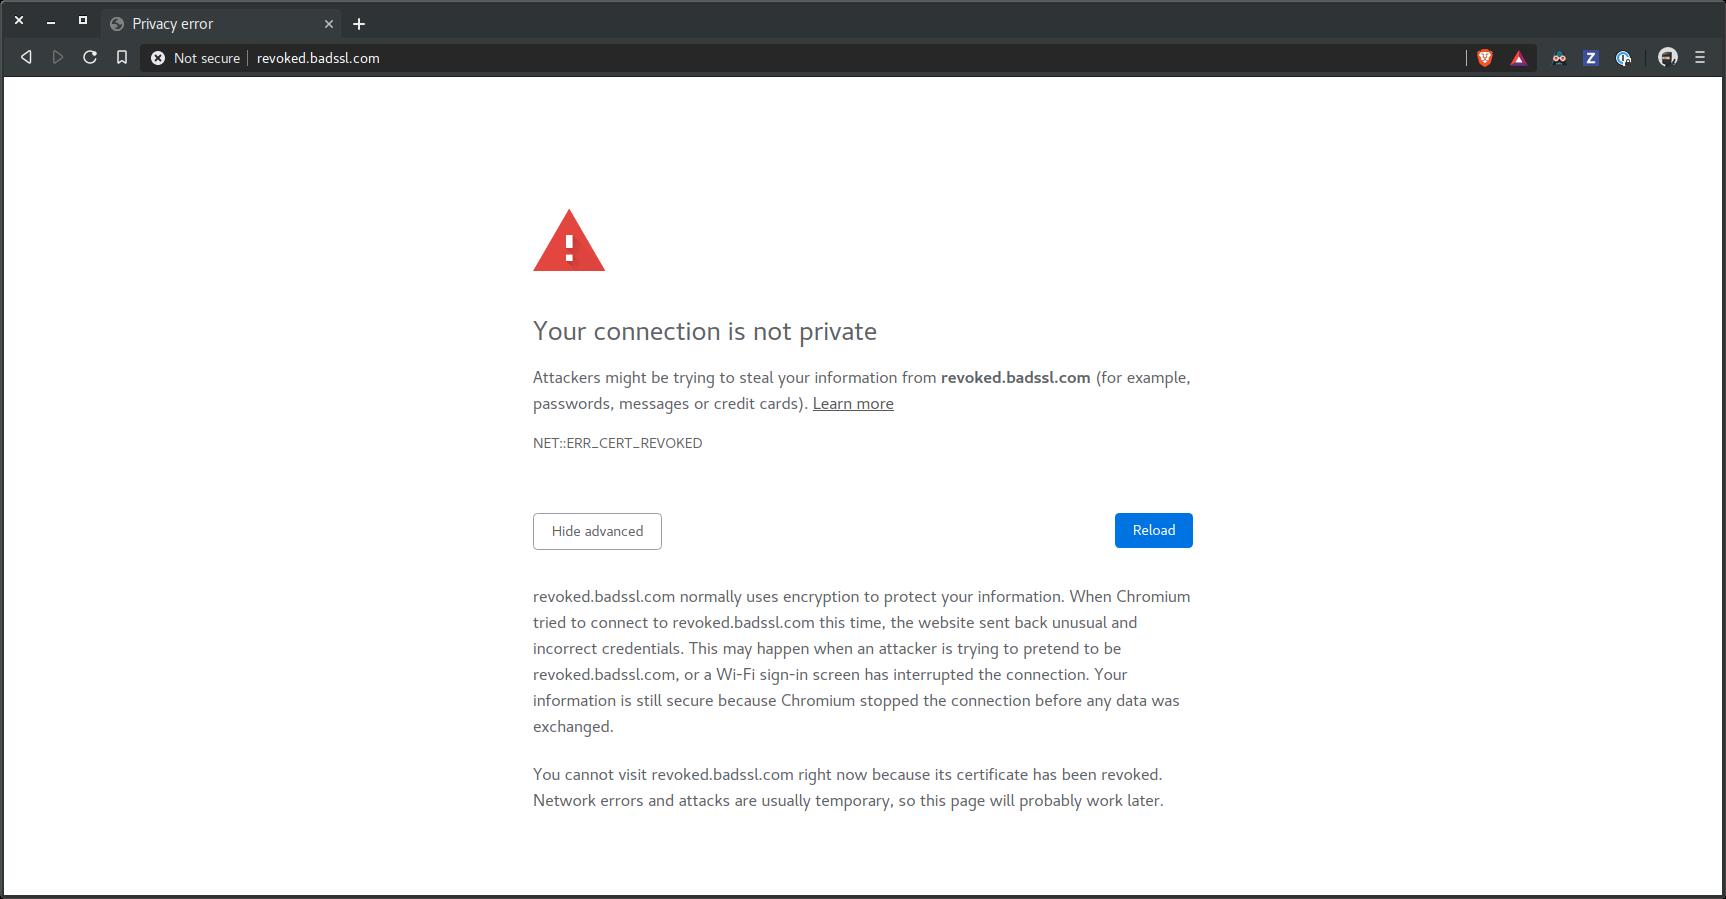 Fix Chromium text in cert error page · Issue #4332 · brave/brave